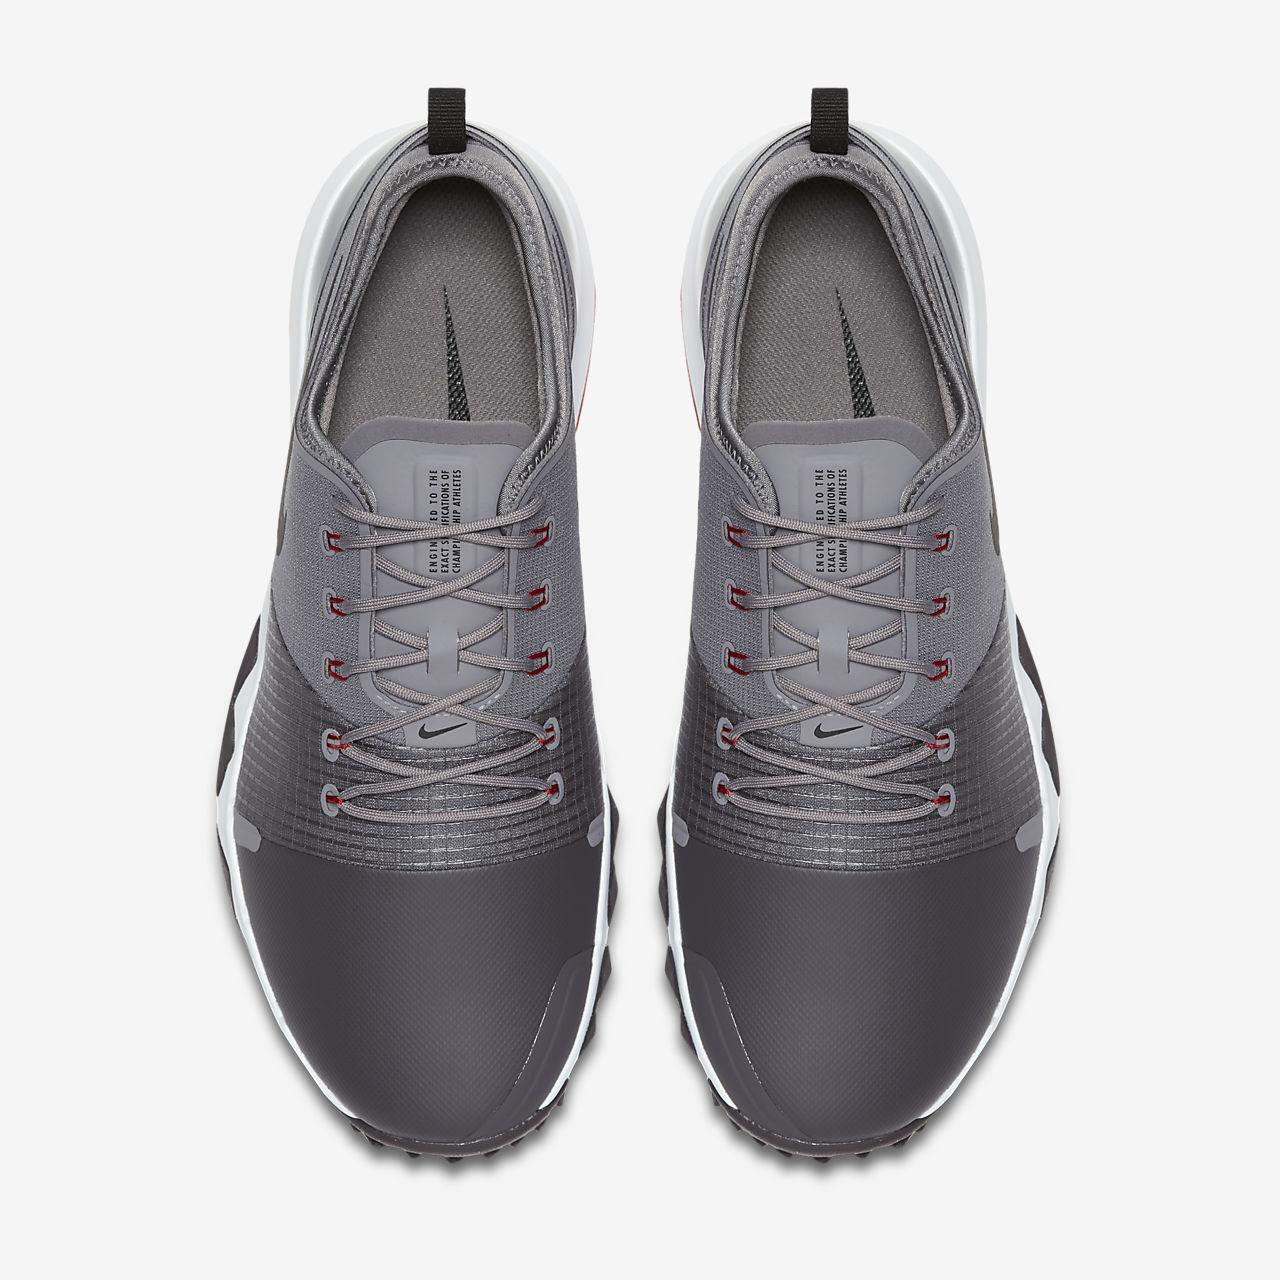 sale retailer 61f73 925c4 ... Nike FI Impact 3 Men s Golf Shoe